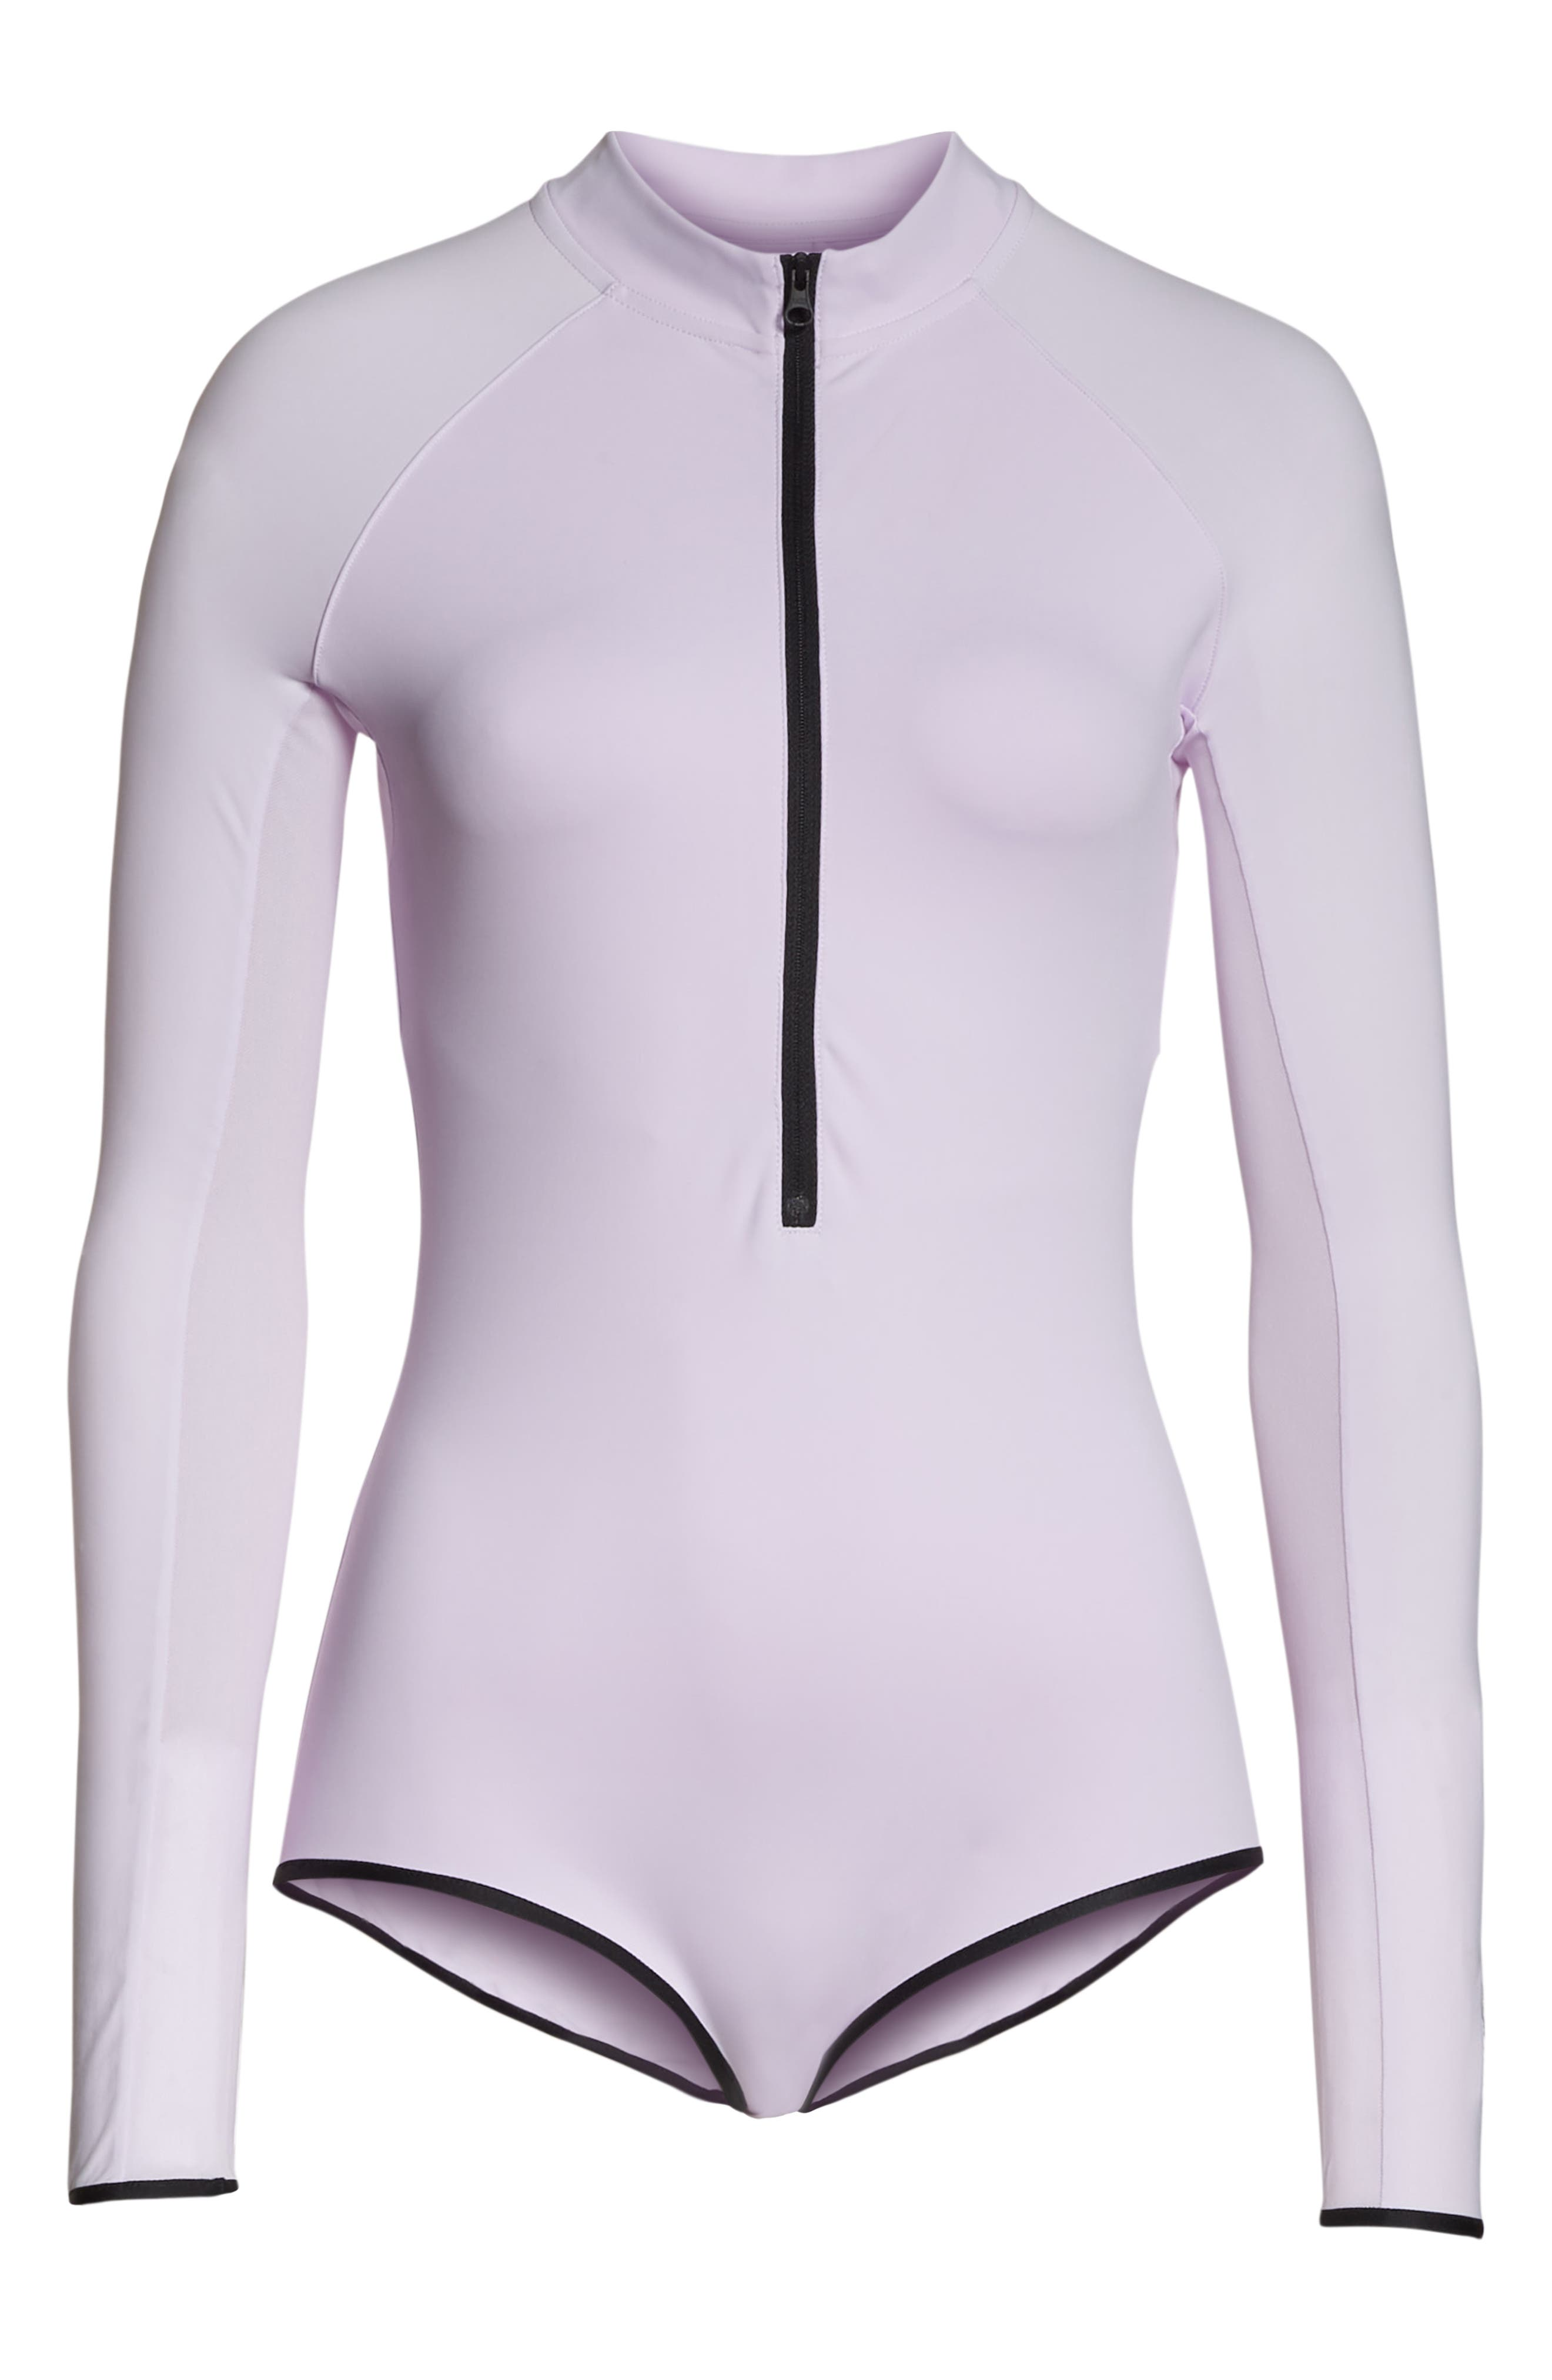 NRG Women's Dri-FIT Long Sleeve Bodysuit,                             Alternate thumbnail 7, color,                             BARELY GRAPE/ BARELY GRAPE